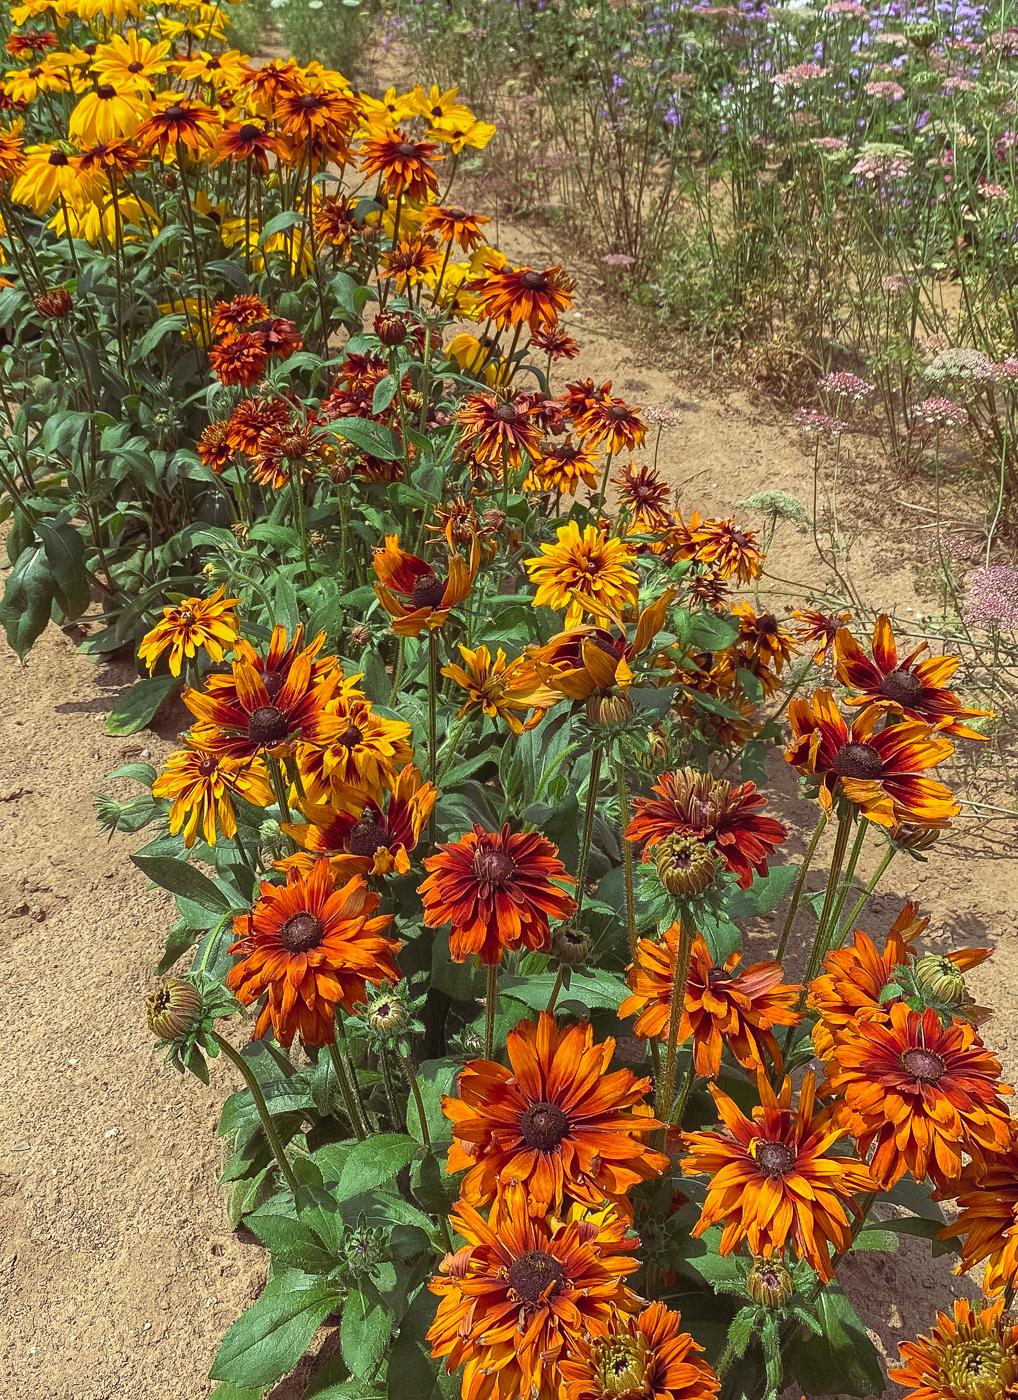 rudbeckia hirta orange,summer garden flowers, blooming flowers, summer flowers that bloom